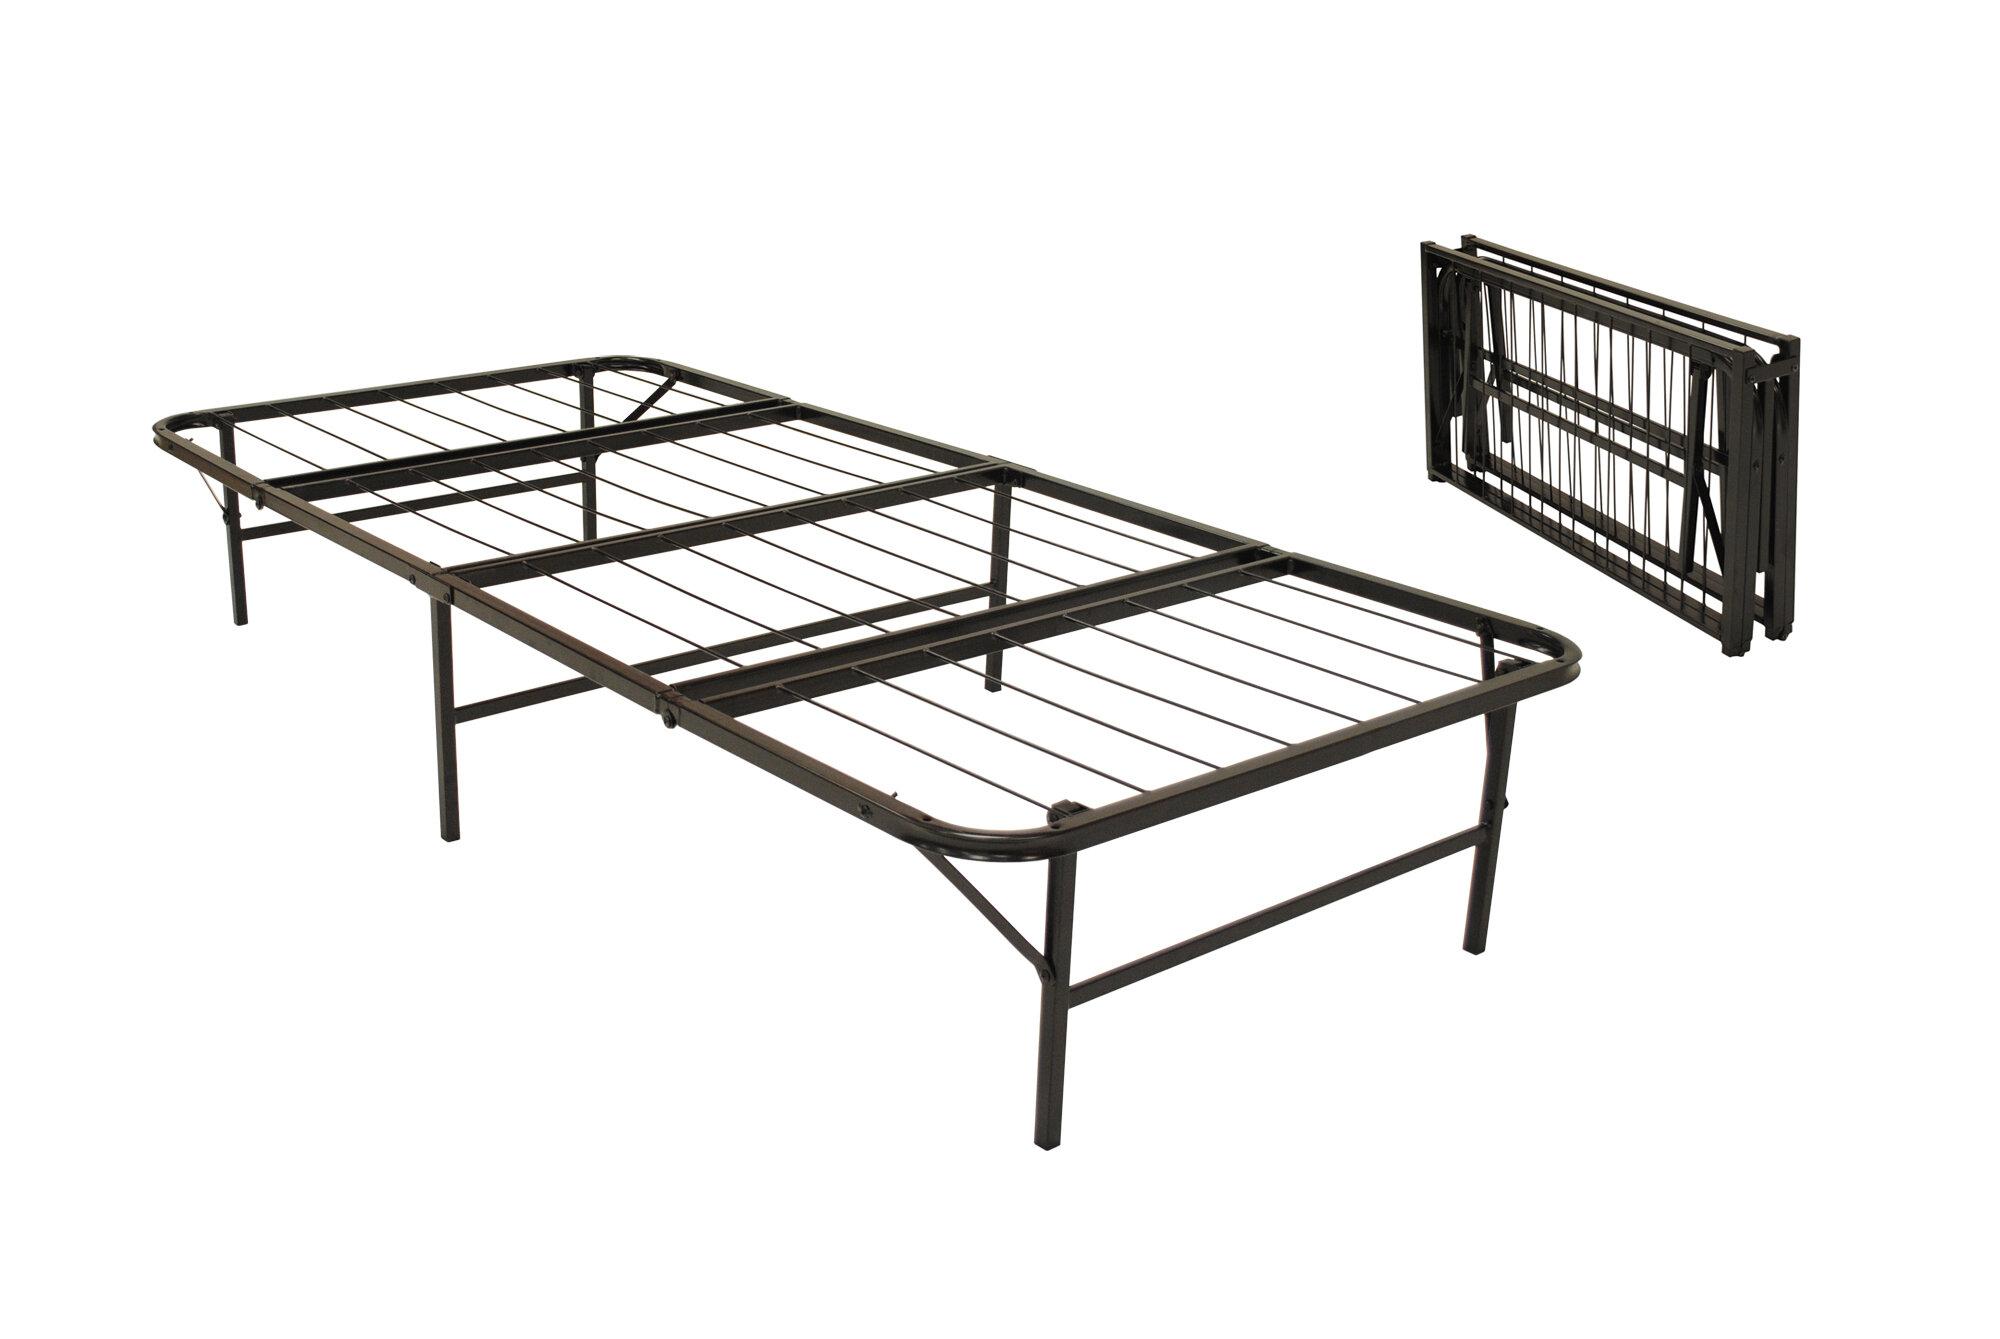 Alwyn Home Damaris Quad Fold Bed Frame Reviews